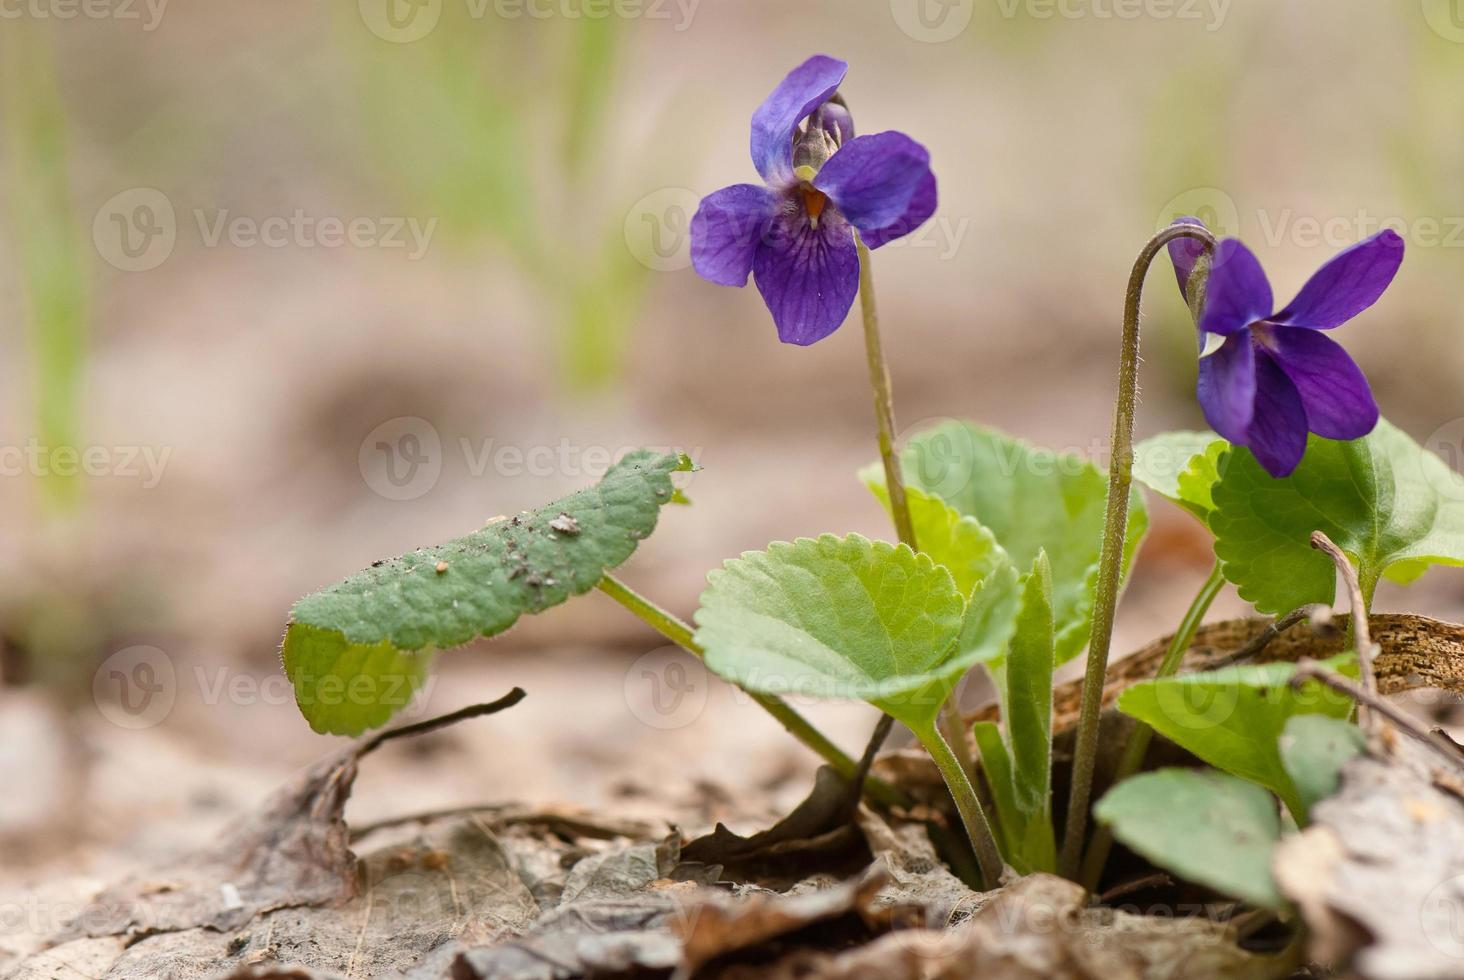 flores violetas selvagens foto